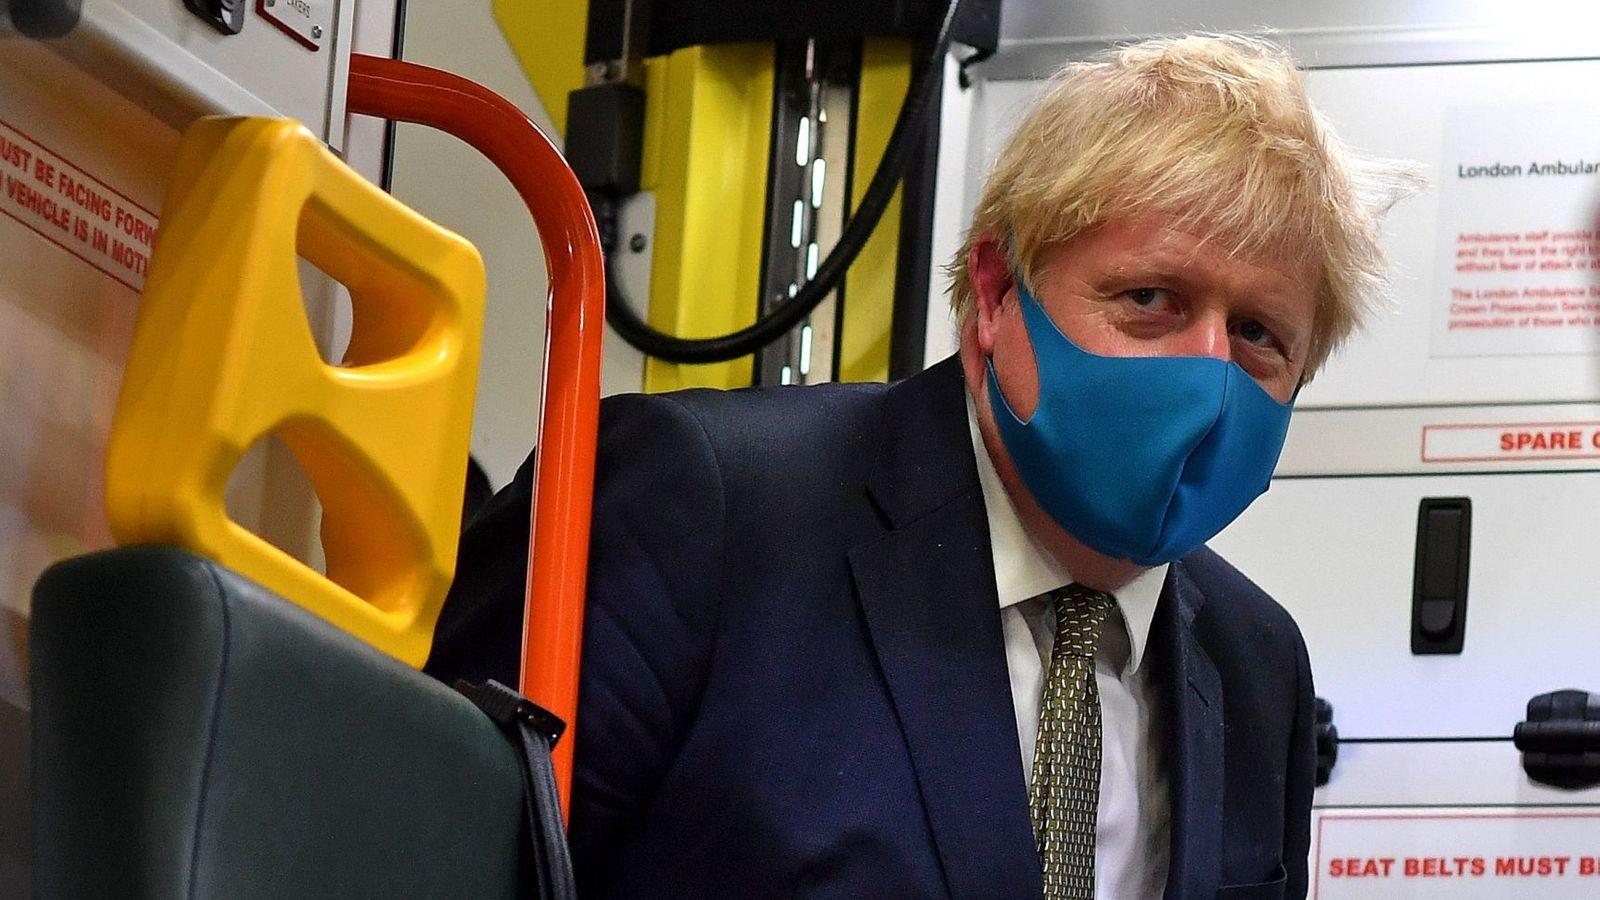 Coronavirus: Return to economic health unlikely amid lockdown uncertainty | UK News